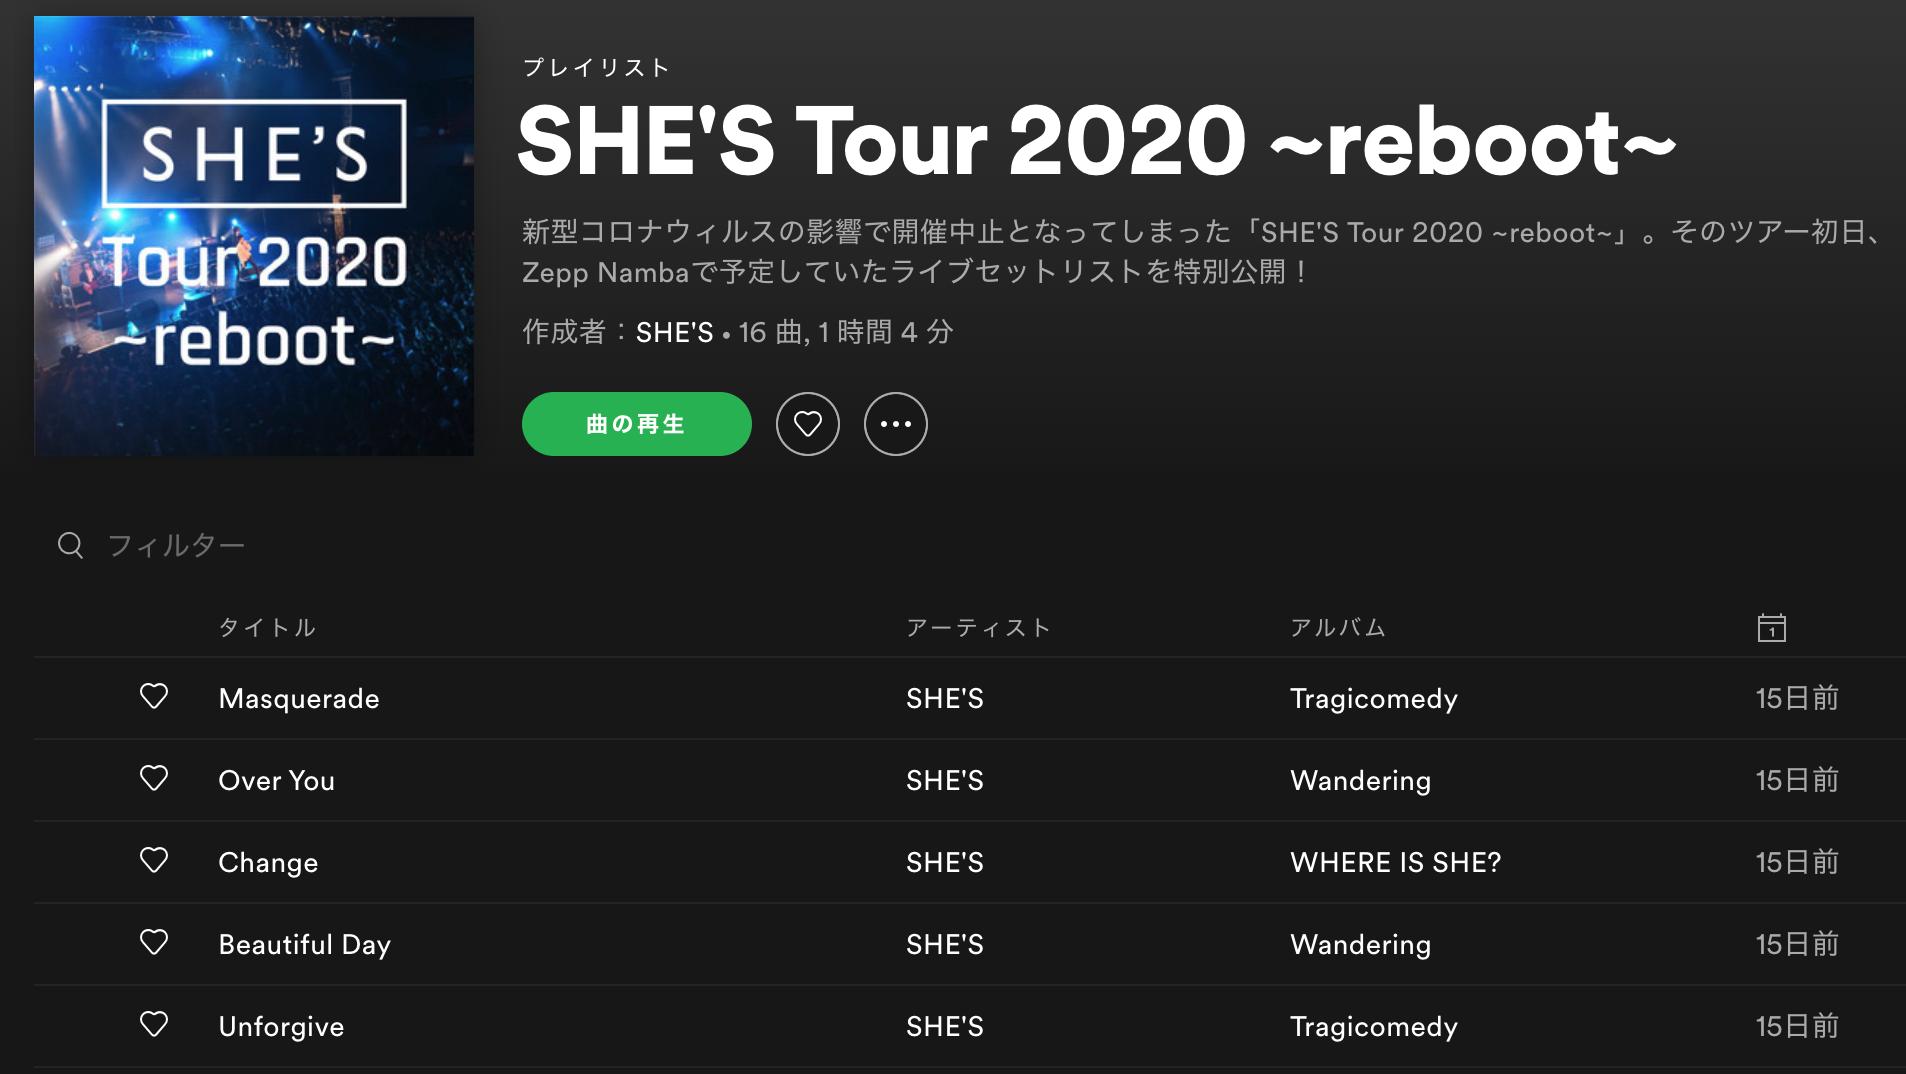 SHE'S Tour 2020